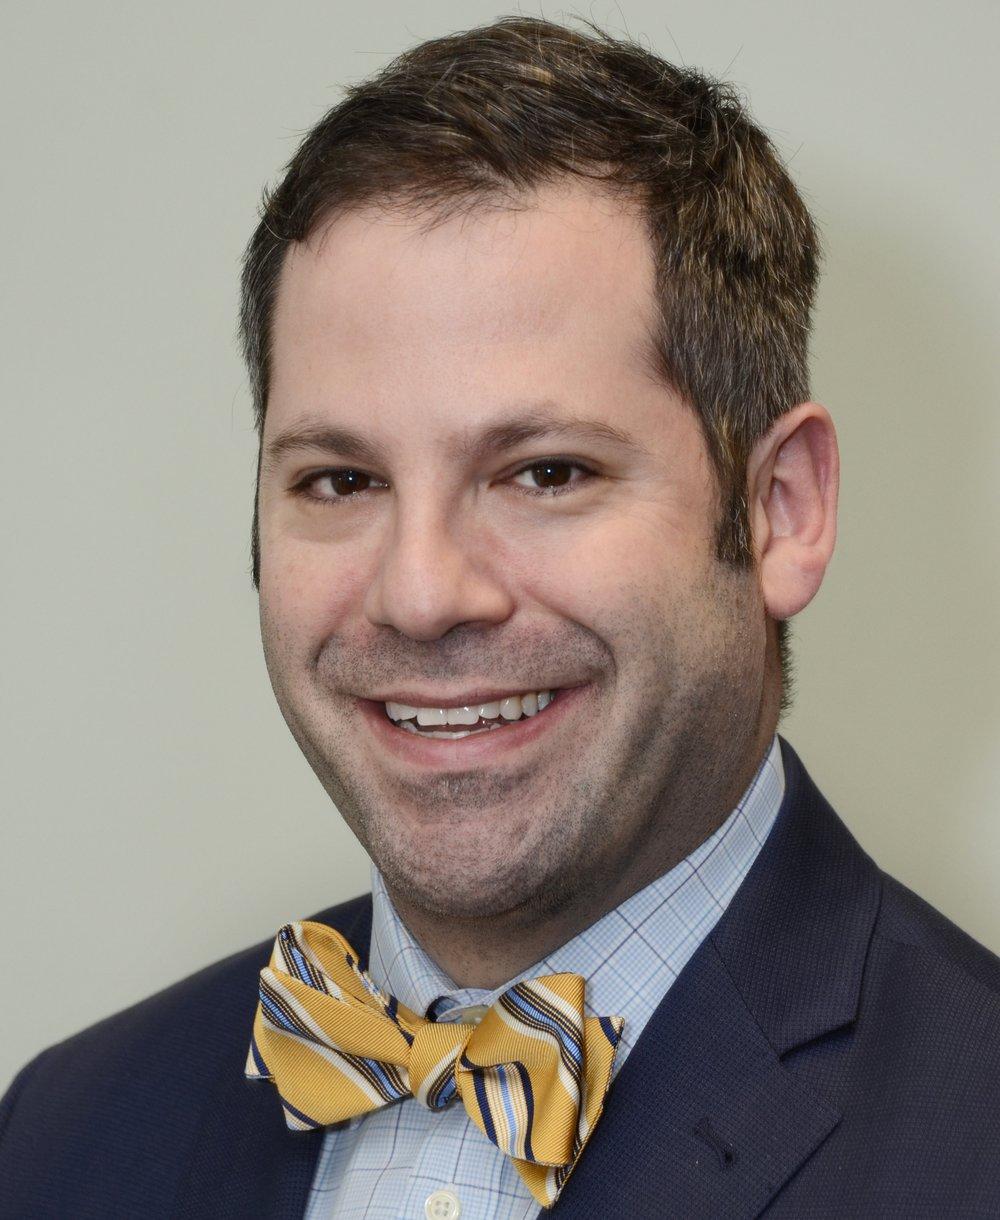 Dr. Corey Anolik